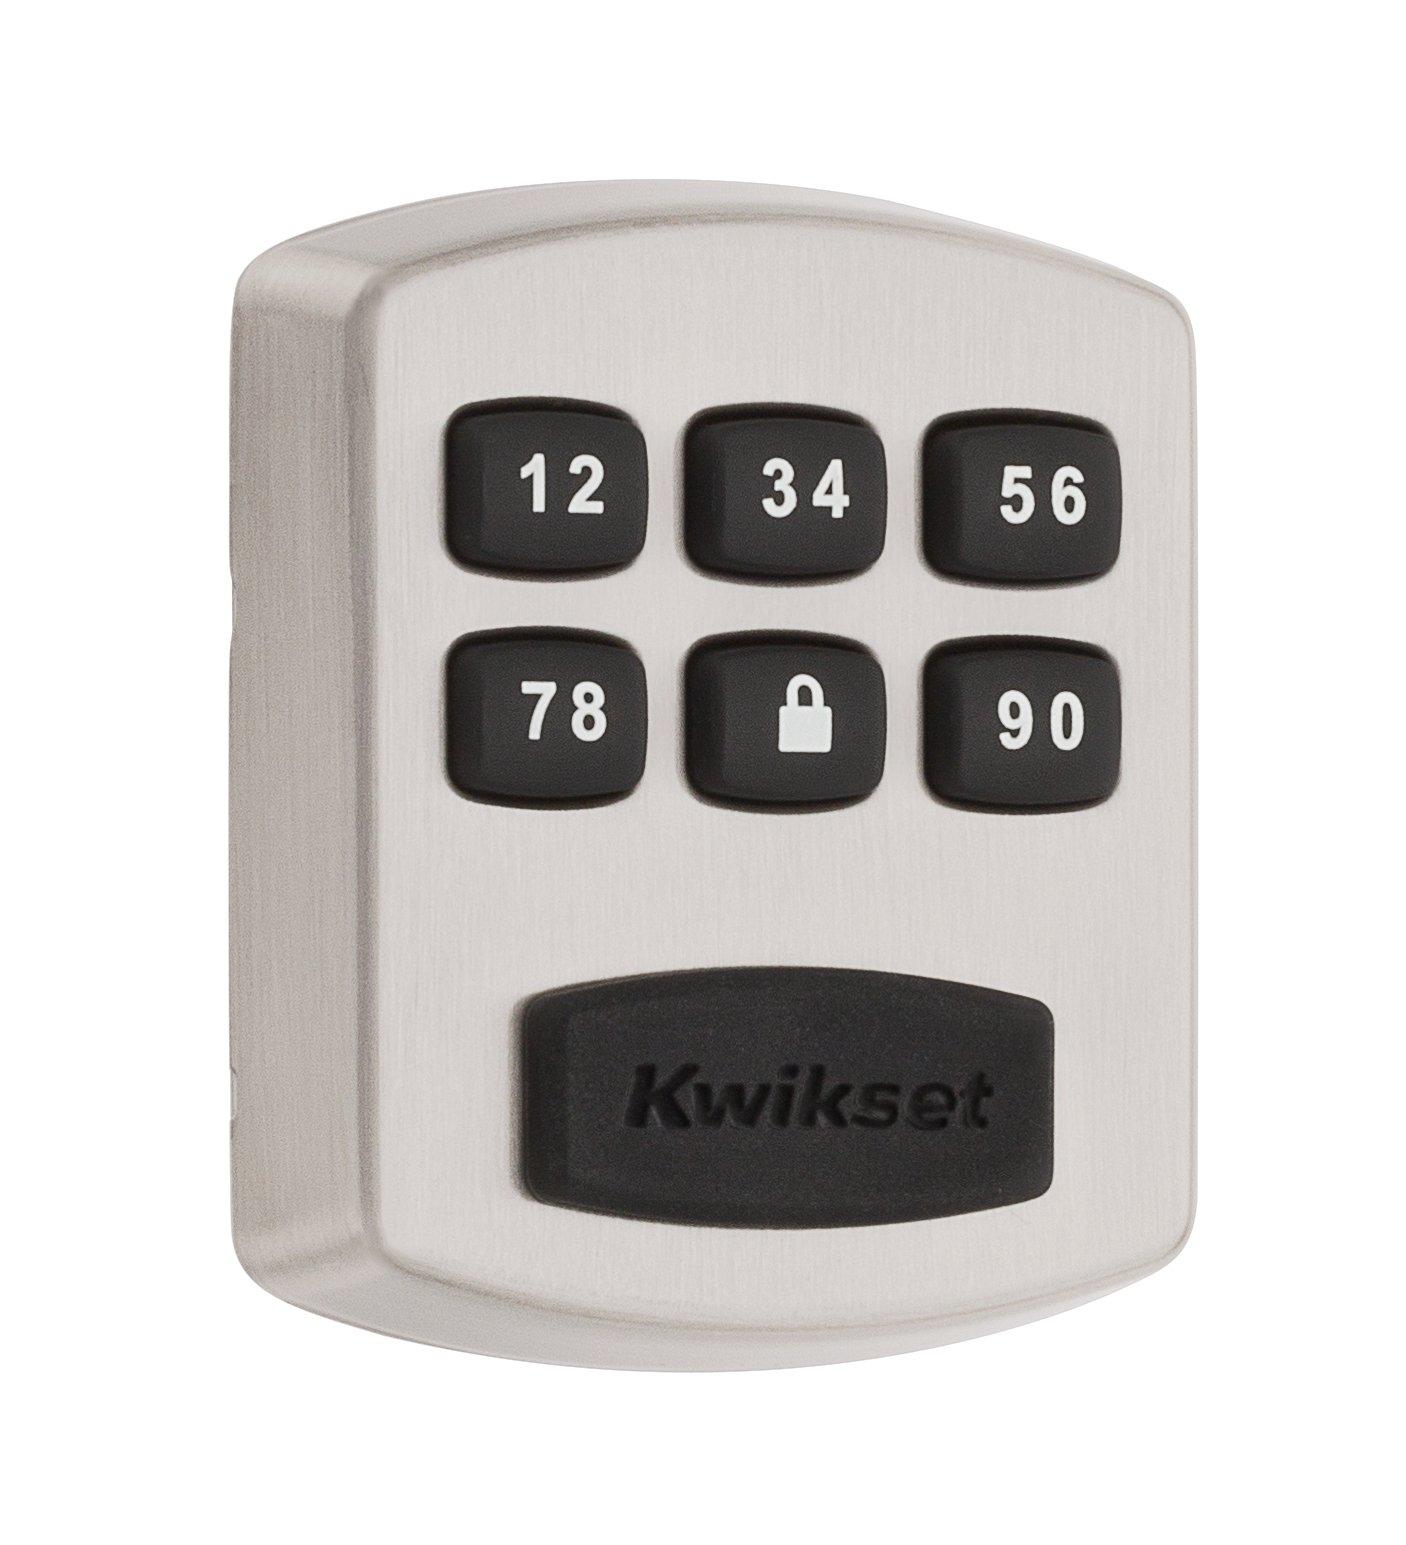 Kwikset 99050-003 Model 905 Value Lock Keyless Entry Electronic Keypad Deadbolt for Garage or Side Door, Satin Nickel